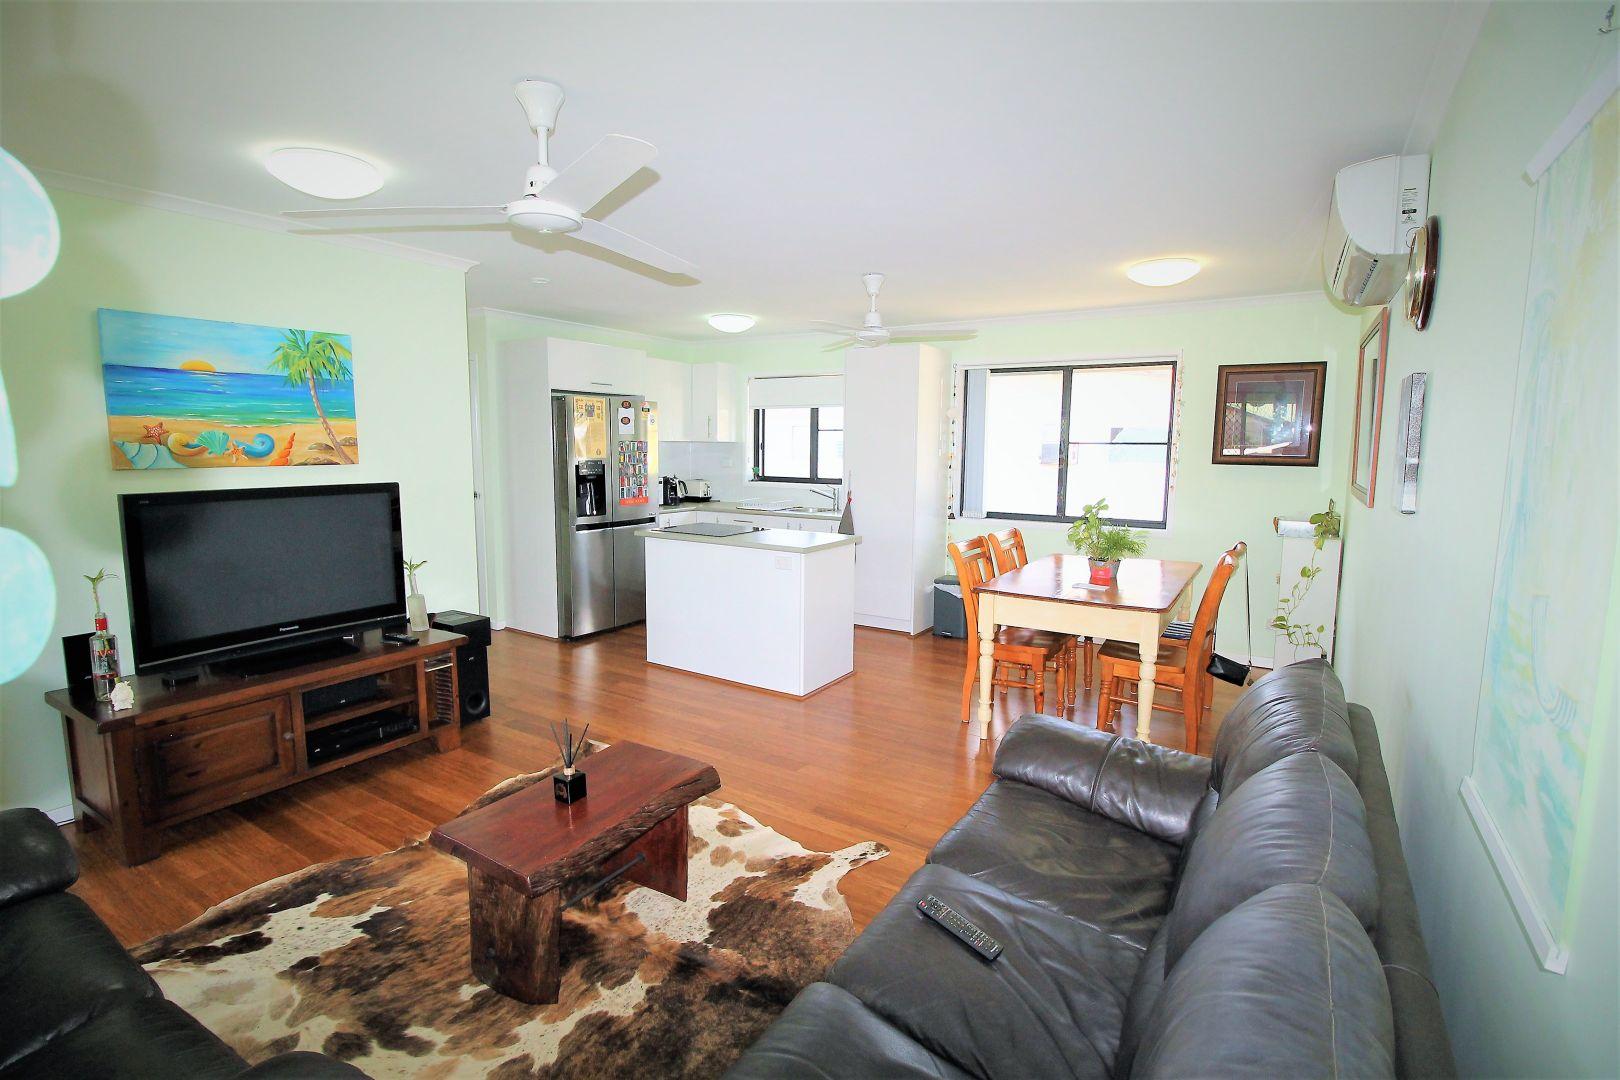 18 McCarthy Street, Hay Point QLD 4740, Image 2